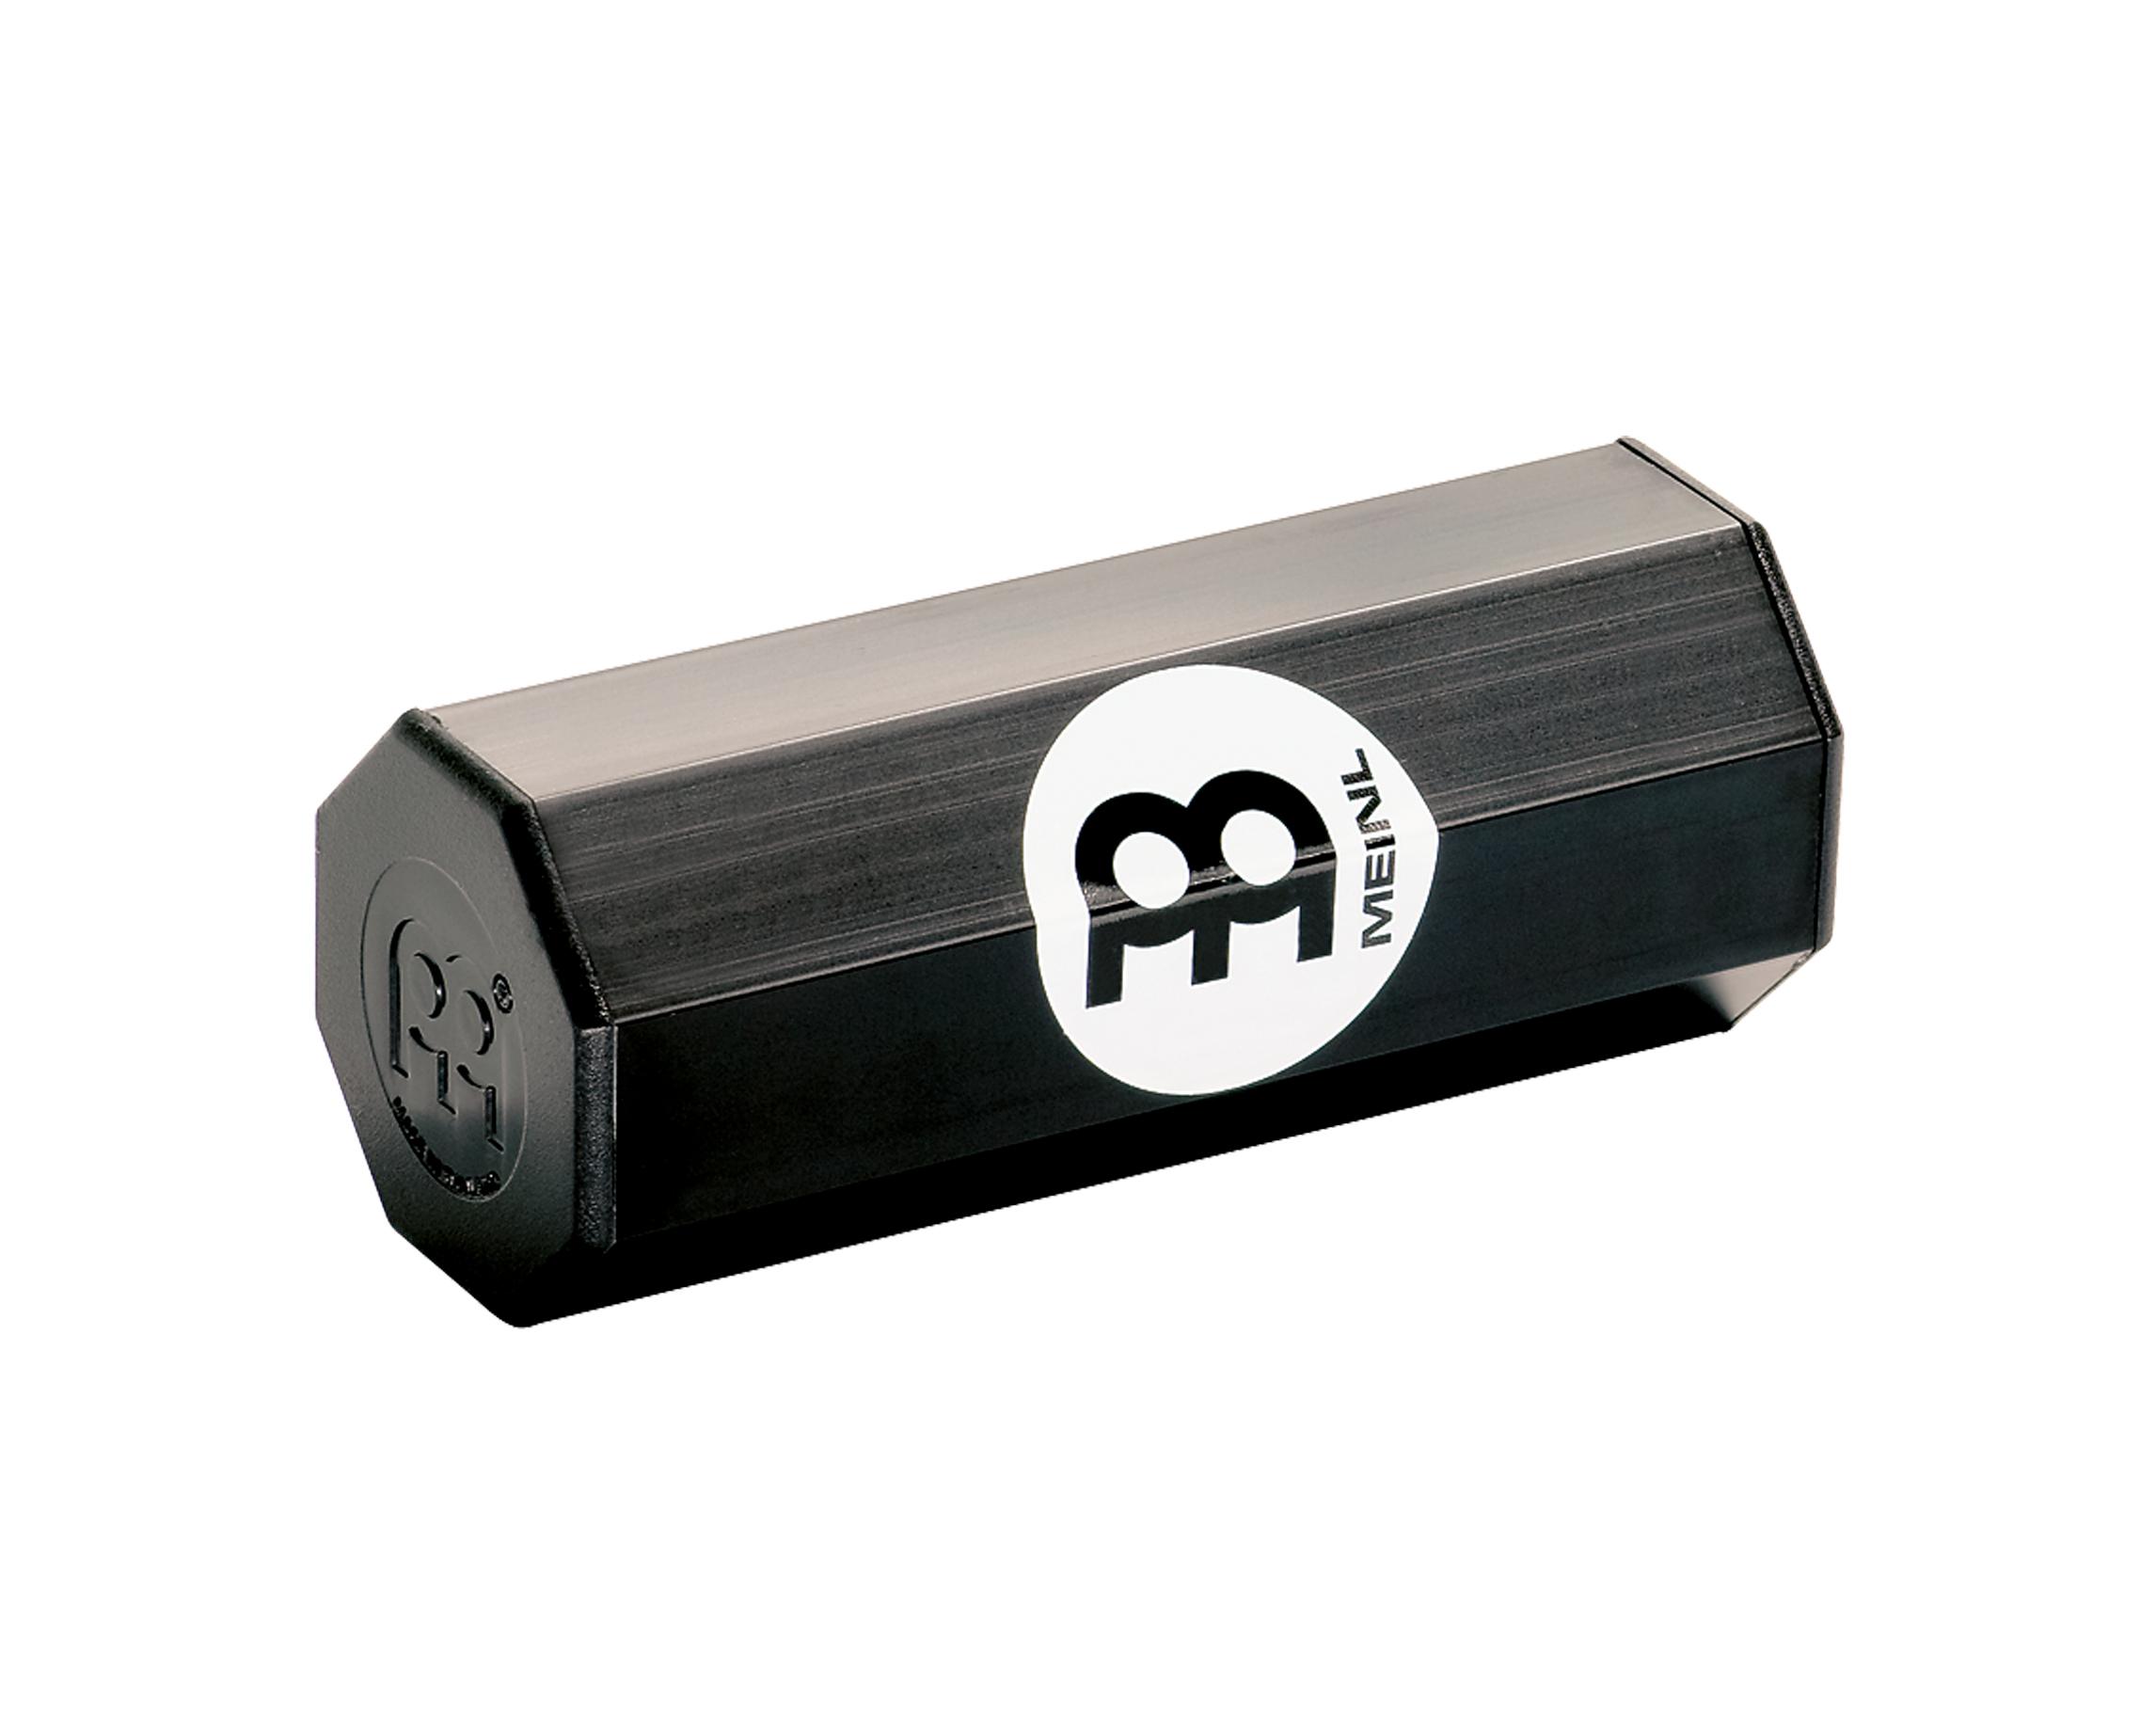 Small Octagonal Aluminum Shaker in Black